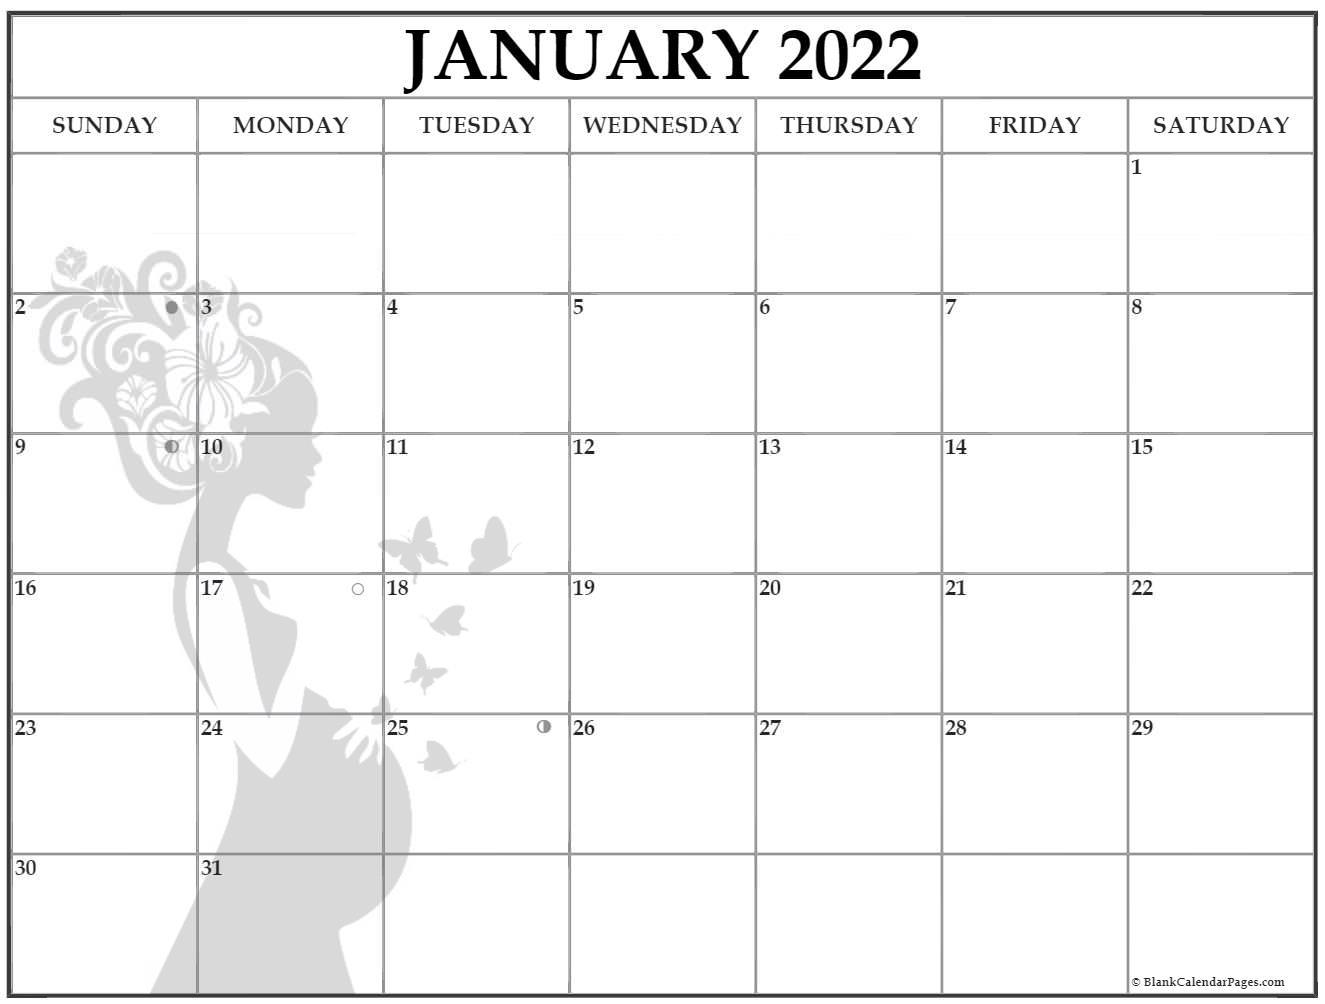 January 2022 Pregnancy Calendar | Fertility Calendar Inside Half Page 2022 January Calendar